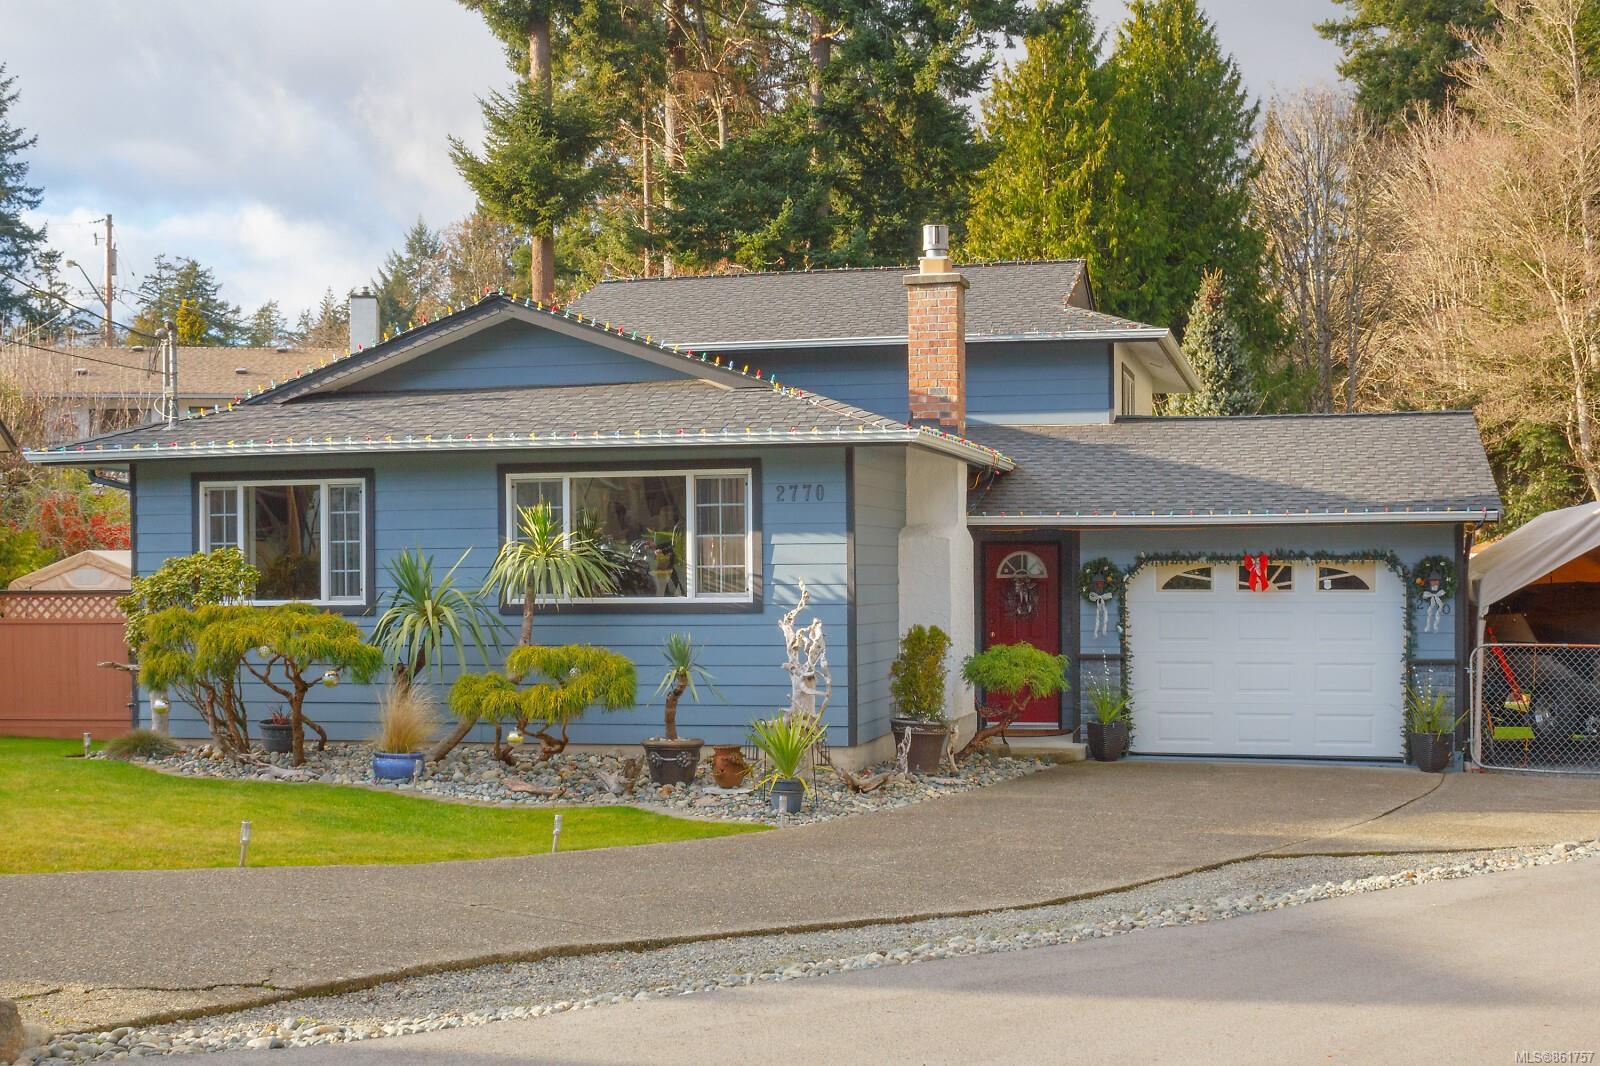 Main Photo: 2770 Kristina Pl in : La Goldstream House for sale (Langford)  : MLS®# 861757